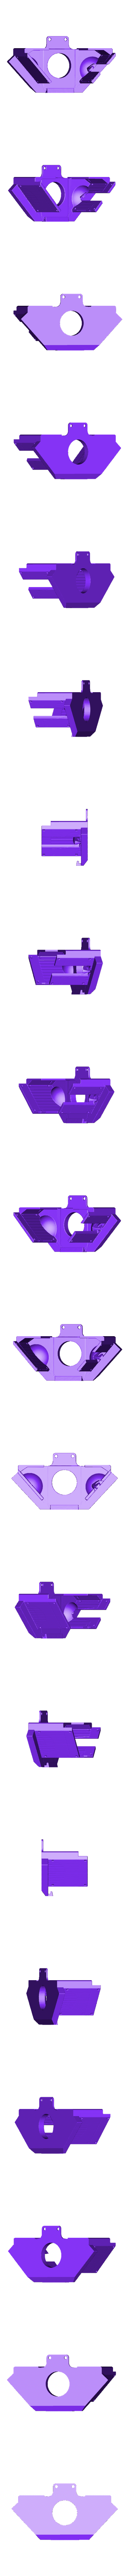 Stabilizer_for_Hotend_V2.stl Download free GCODE file Stabilizer for Hotend (carriage) 2 versions - Two Trees Sapphire 3D printer • 3D printer model, FiveNights